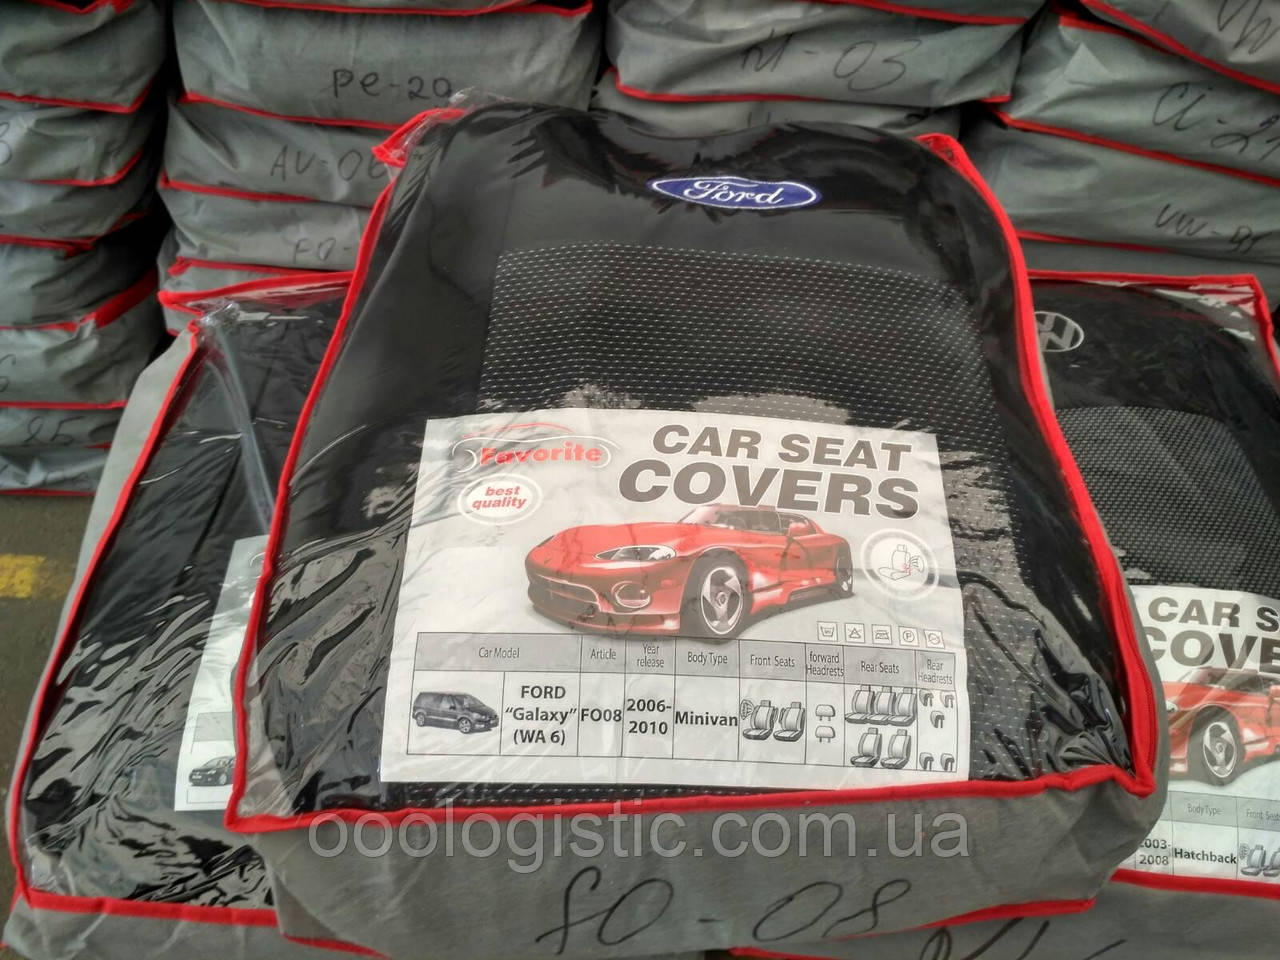 Авточехлы Favorite на Ford Galaxy 2006-2010 minivan,Форд Галакси 2006-2010 минивэн